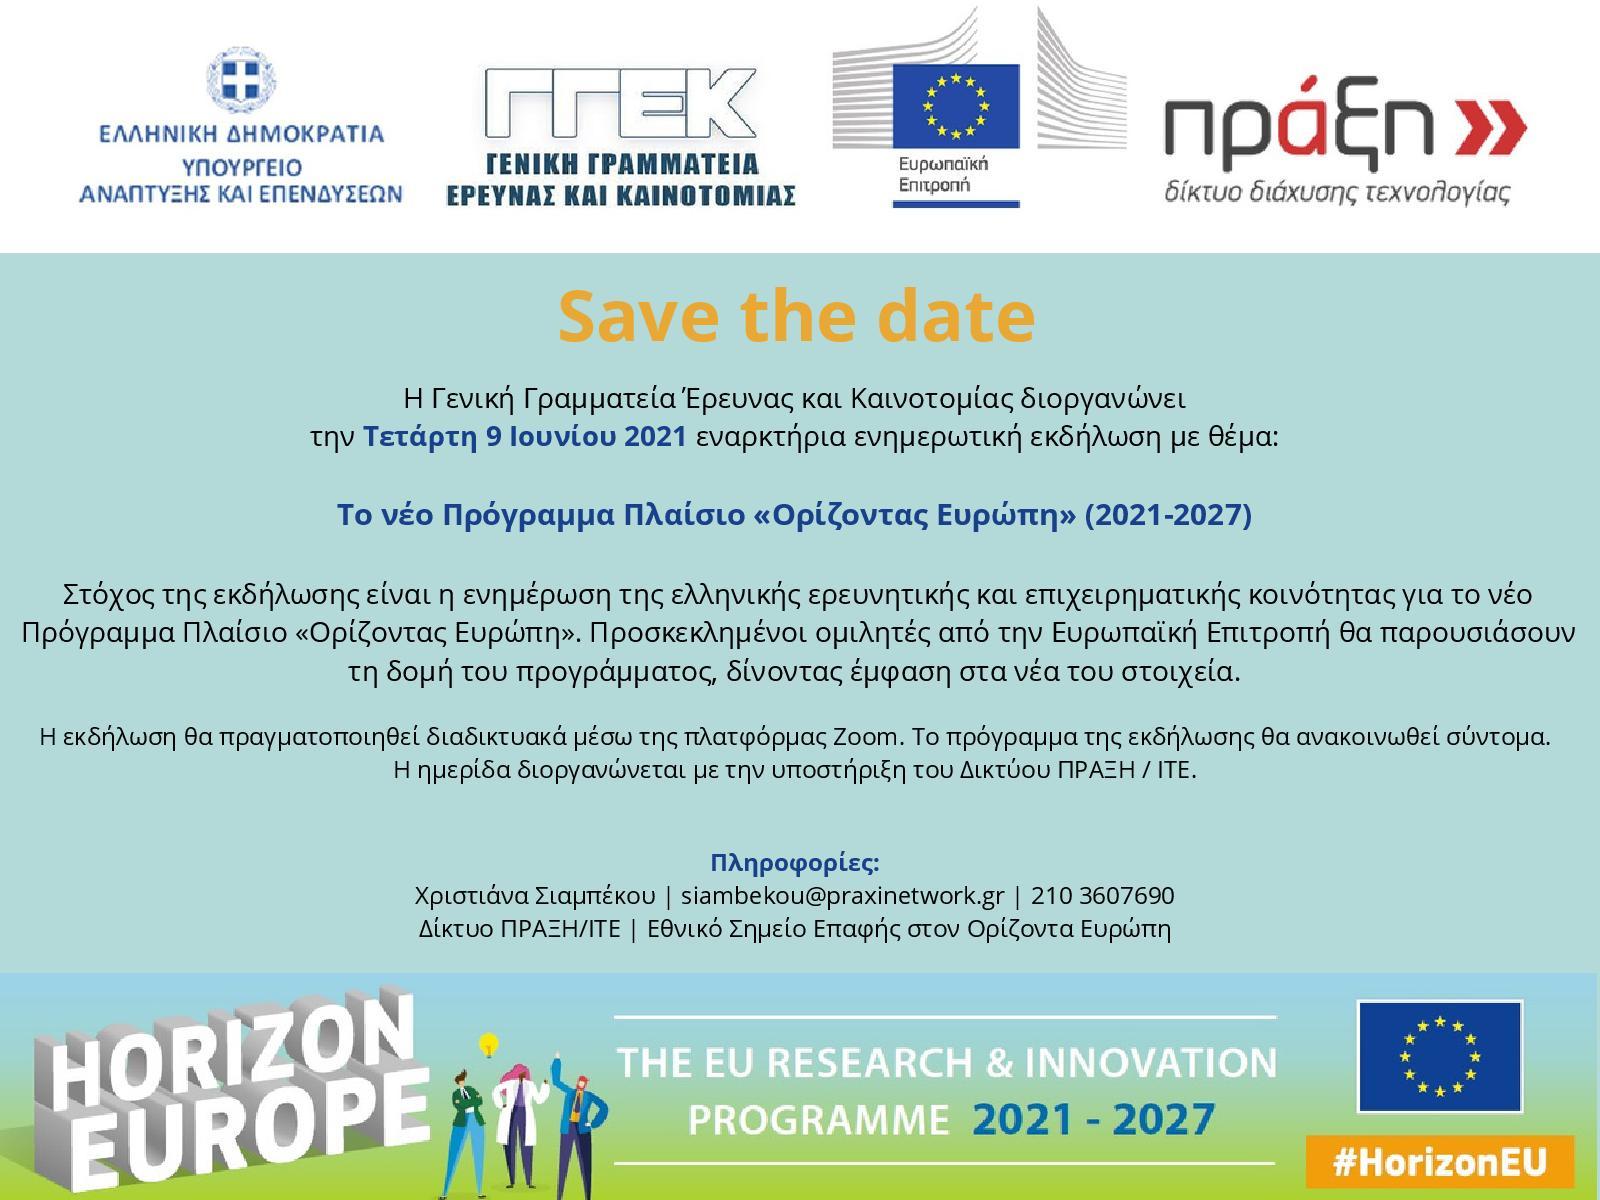 Save the Date! Εναρκτήρια ενημερωτική εκδήλωση για το νέο Πρόγραμμα Πλαίσιο «Ορίζοντας Ευρώπη»